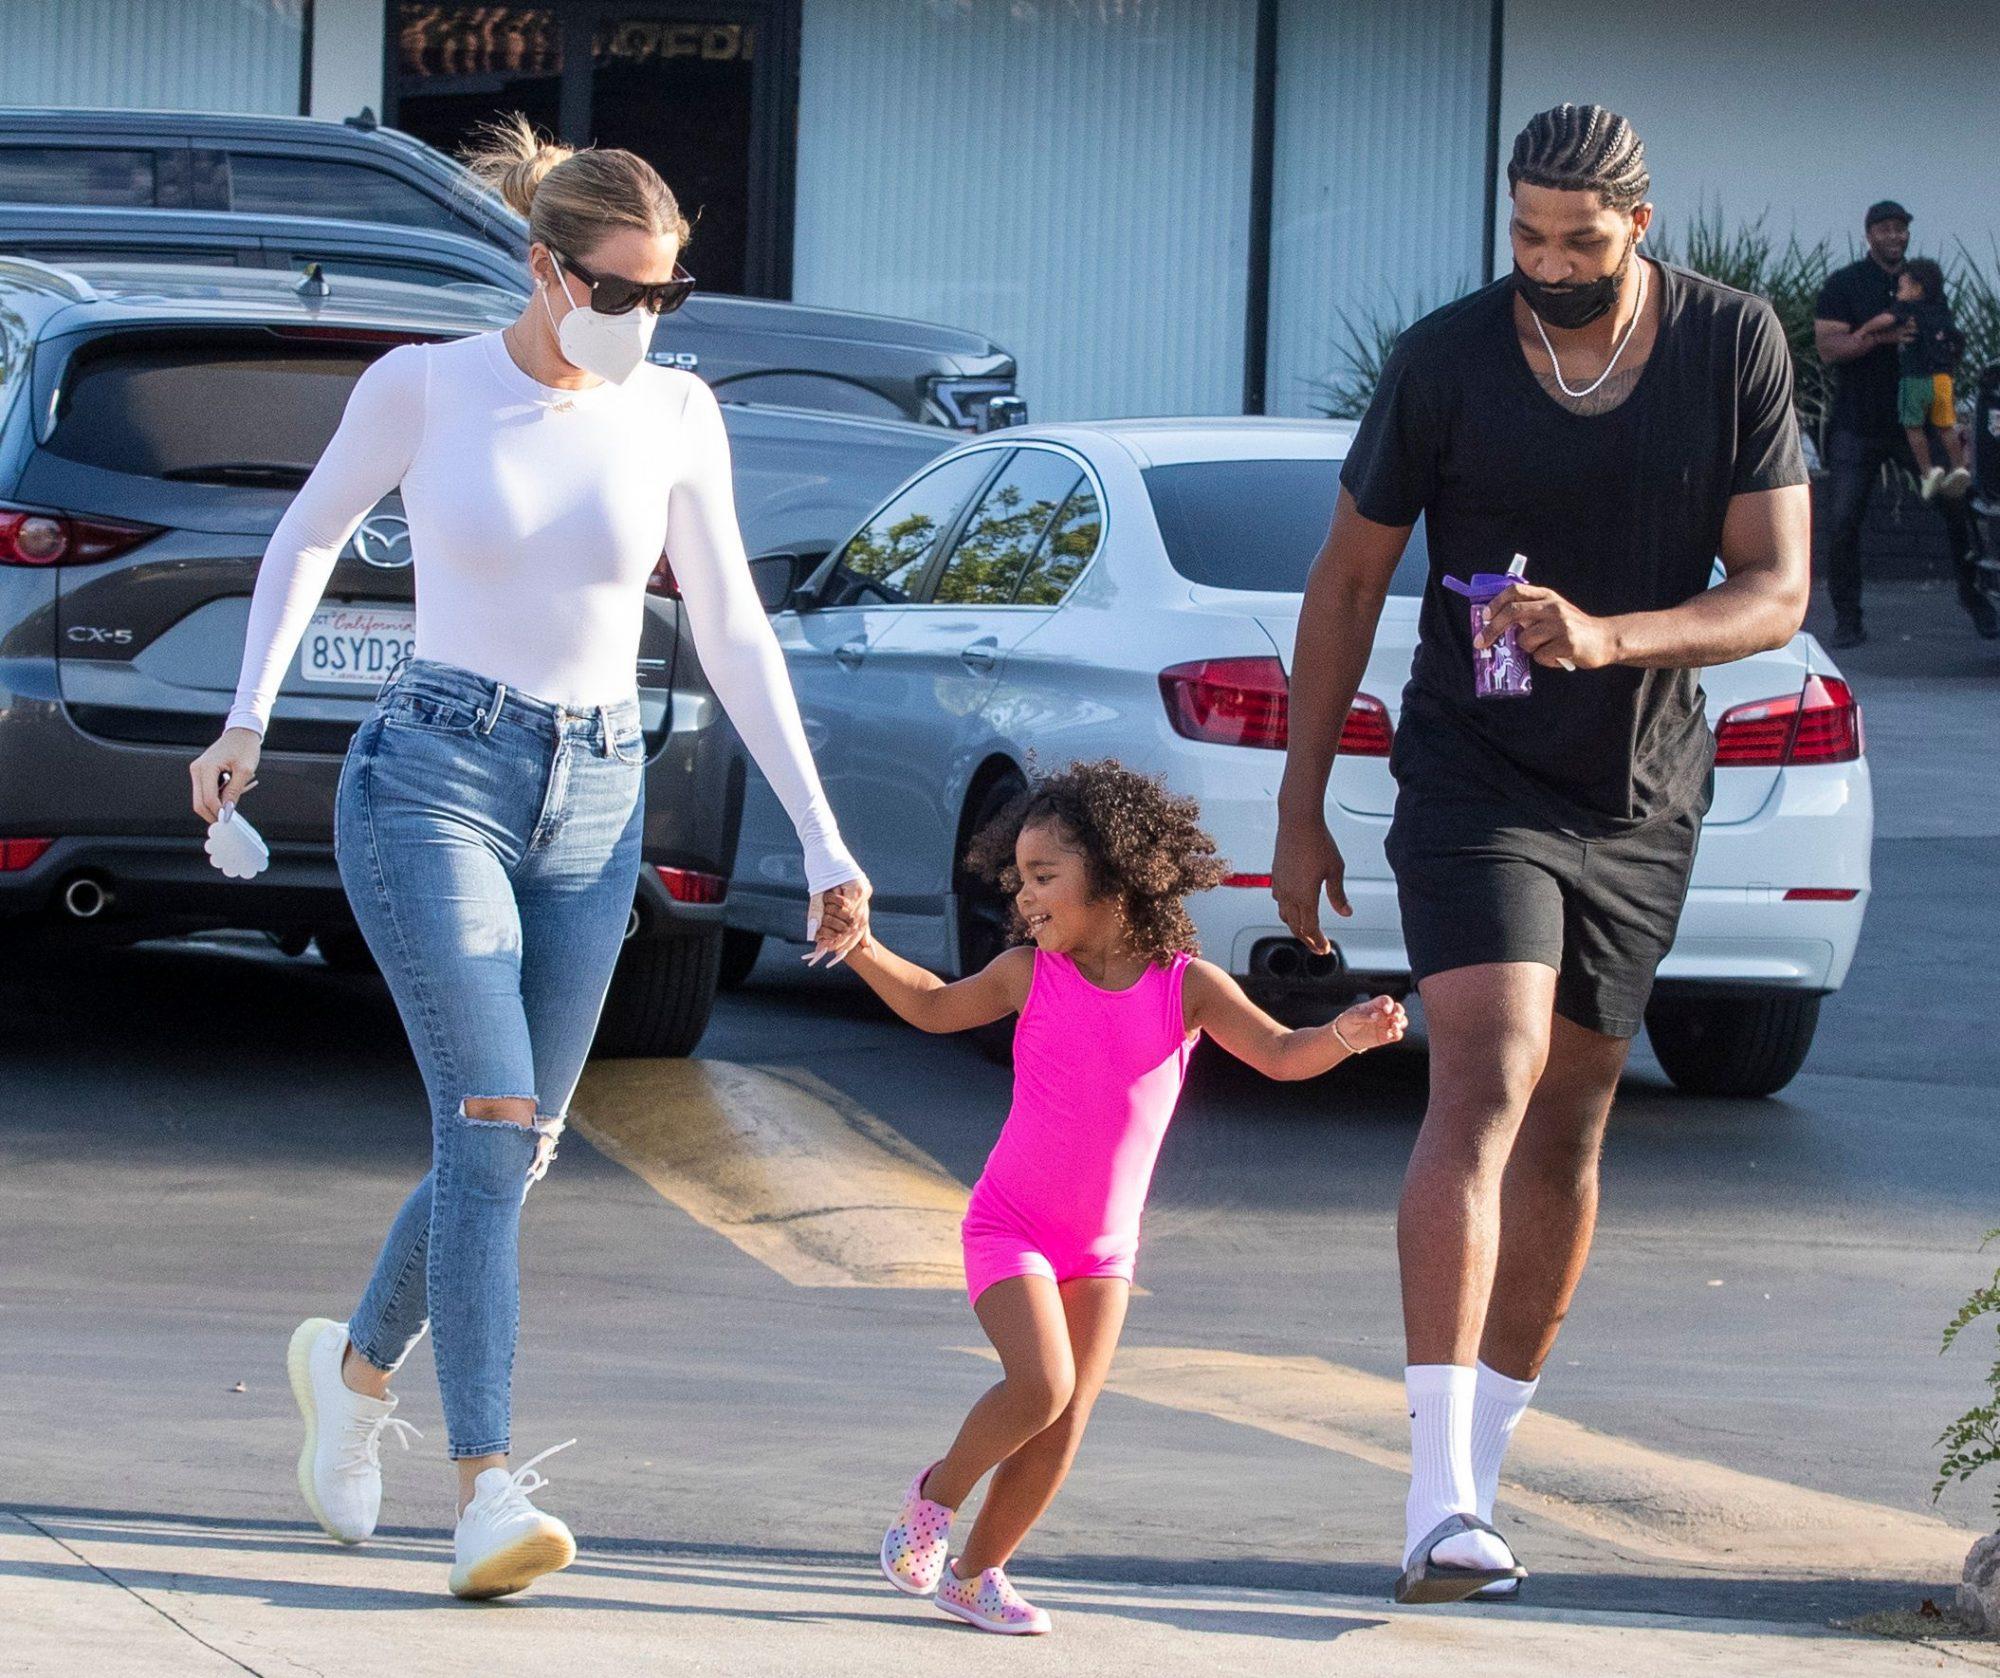 Khloe Kardashian & Tristan Thompson Look Like Quite the Happy Co-Parents as they take True to Gymnastics Class